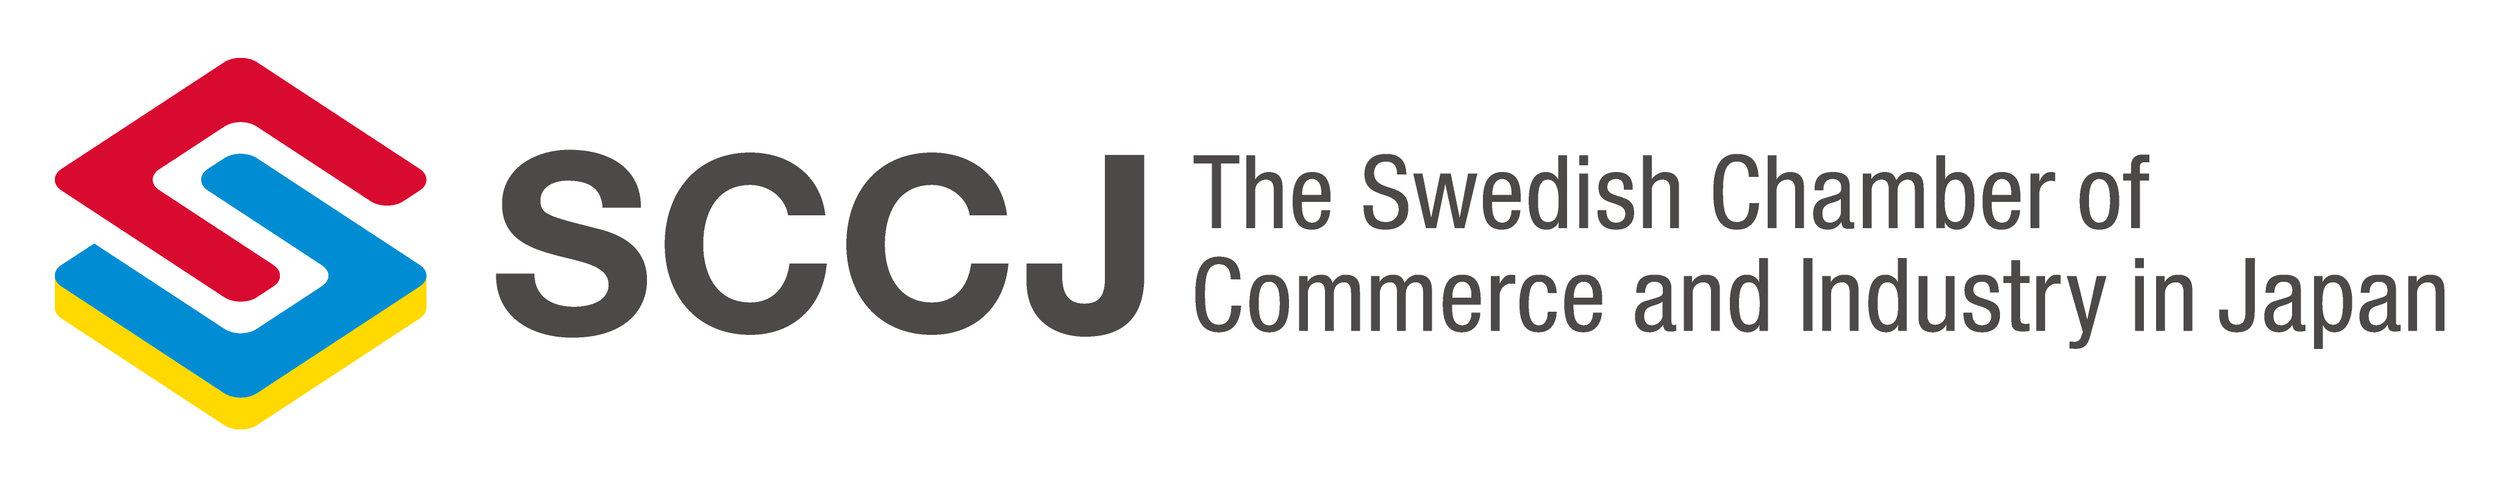 SCCJ_logo3.jpg